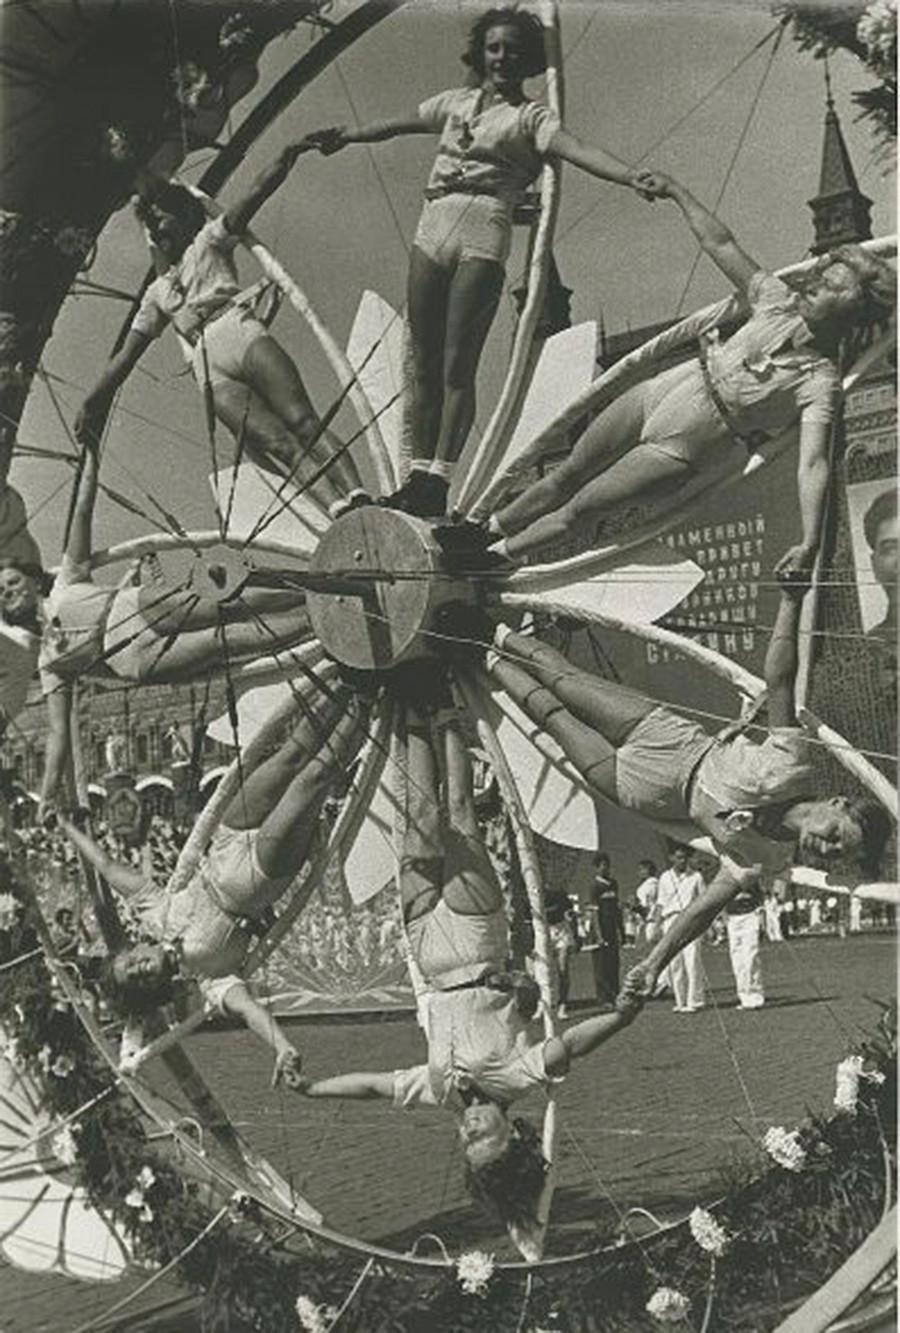 Изпълнение на женска гимнастическа група, 1936 г.